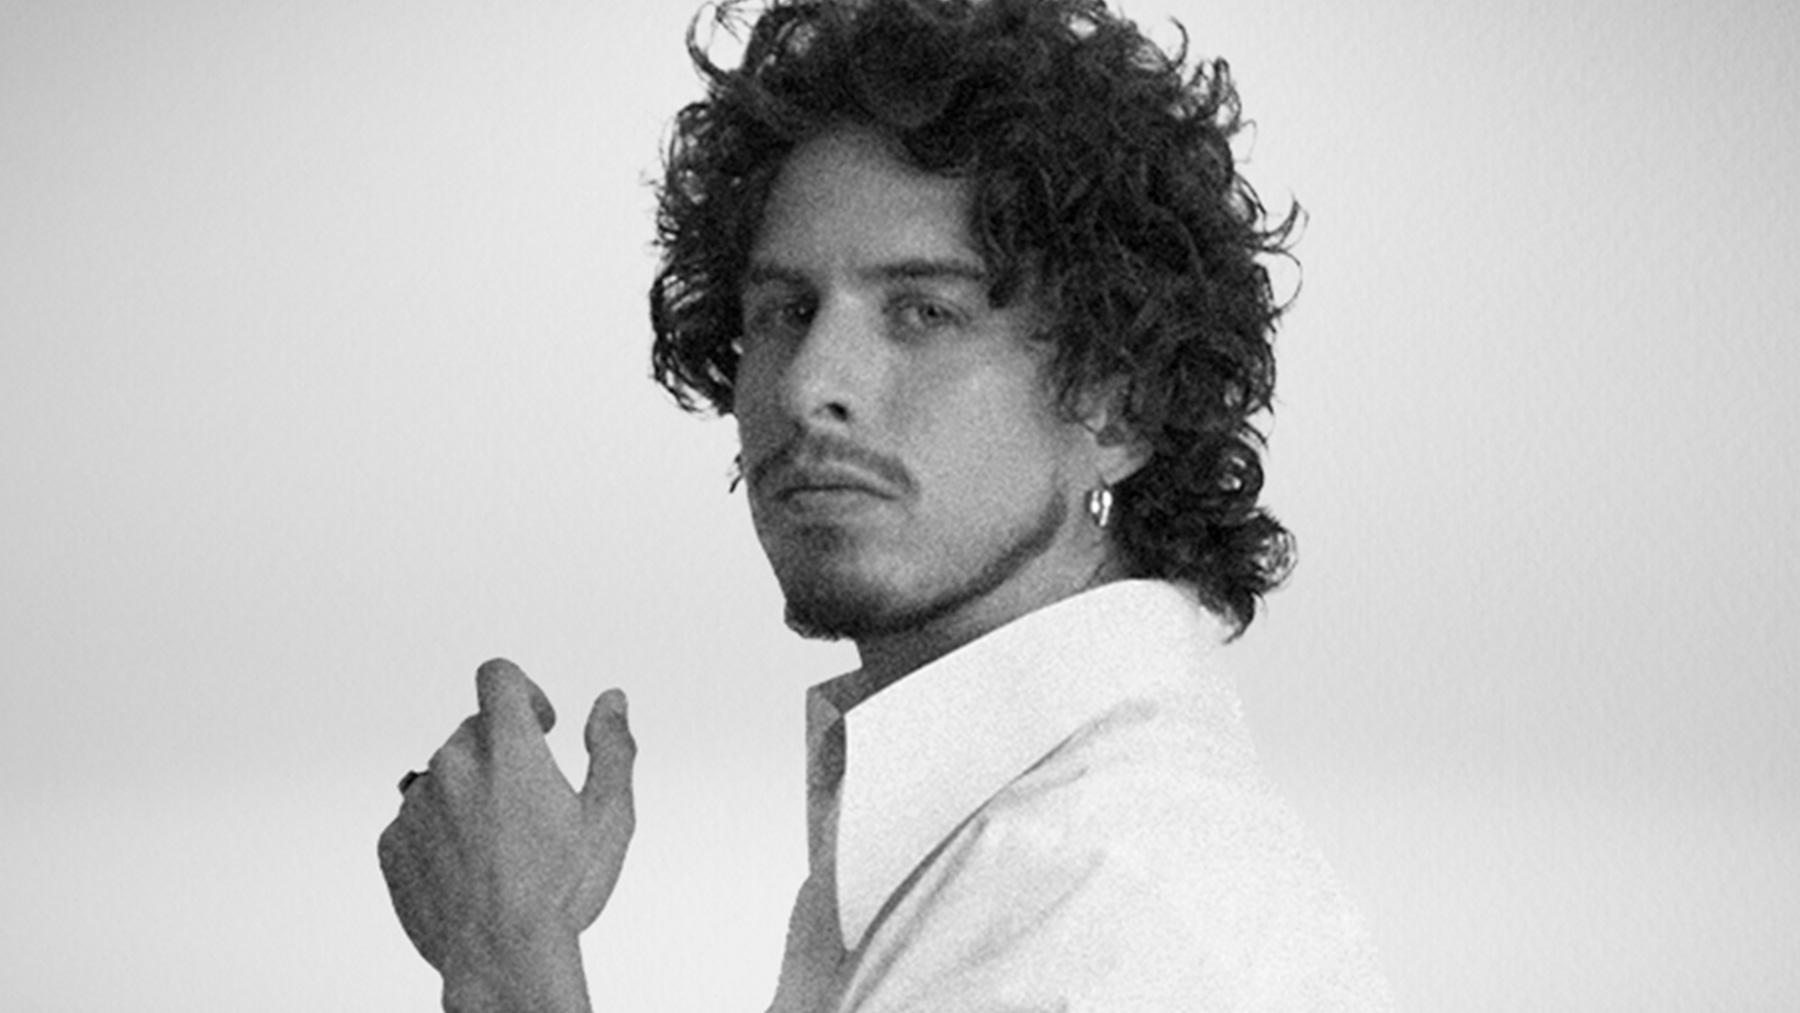 El cantaor Kiki Morente. @Universal